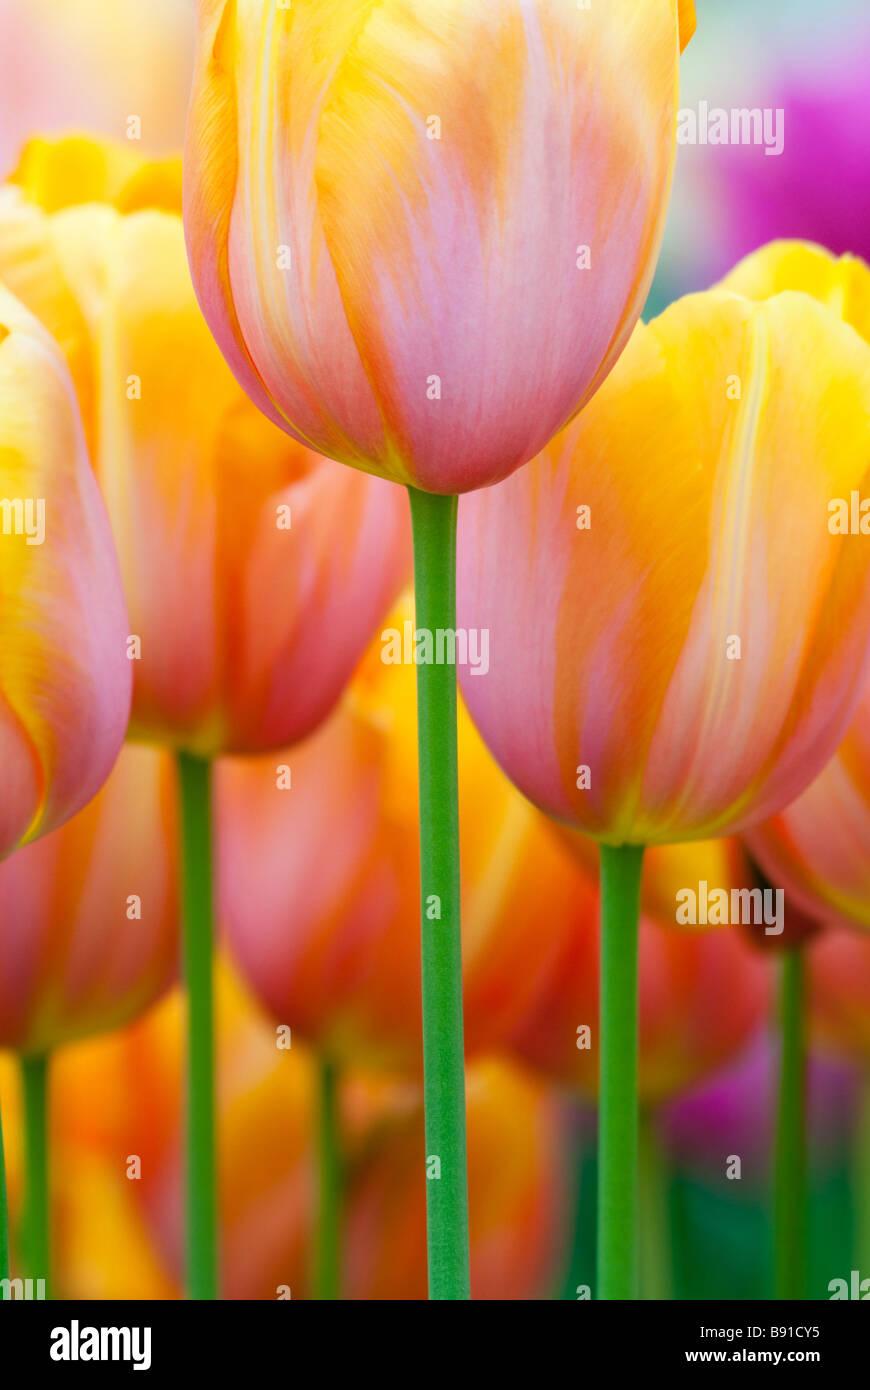 Colorful tulips in spring Keukenhof The Netherlands - Stock Image